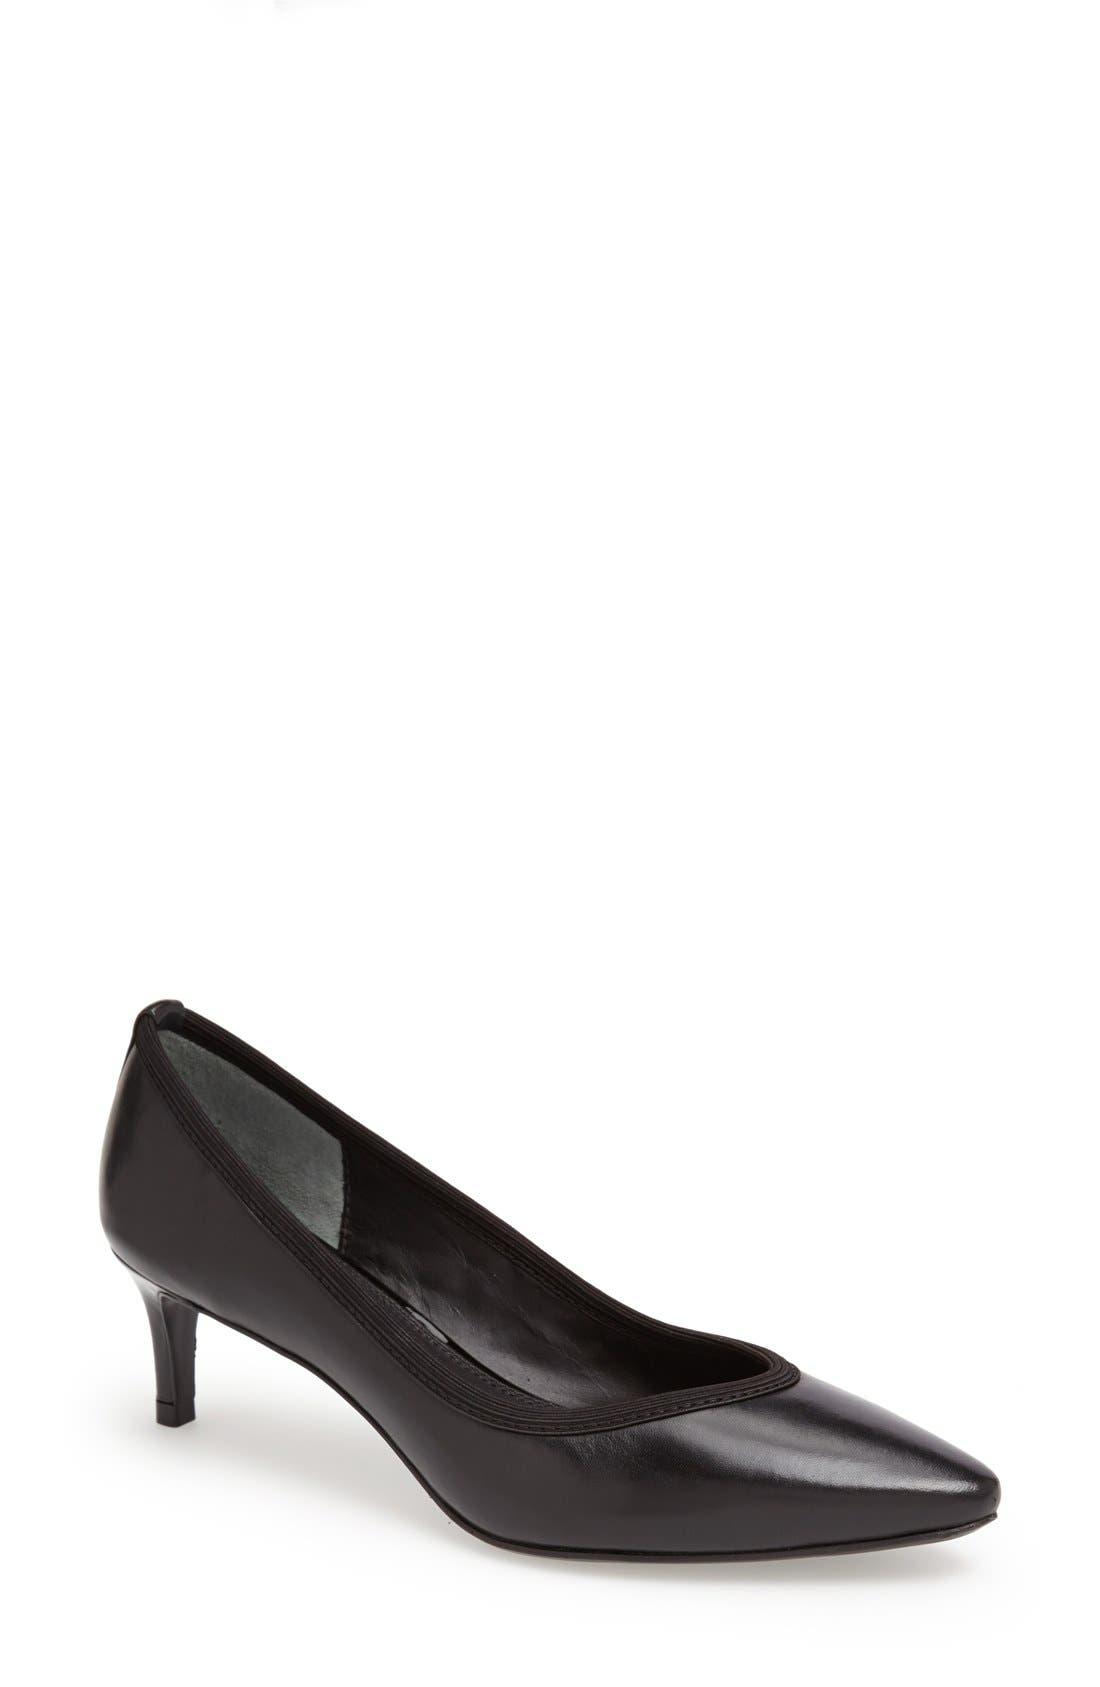 Alternate Image 1 Selected - Diana von Furstenberg 'Faline' Pointy Toe Leather Pump (Women)